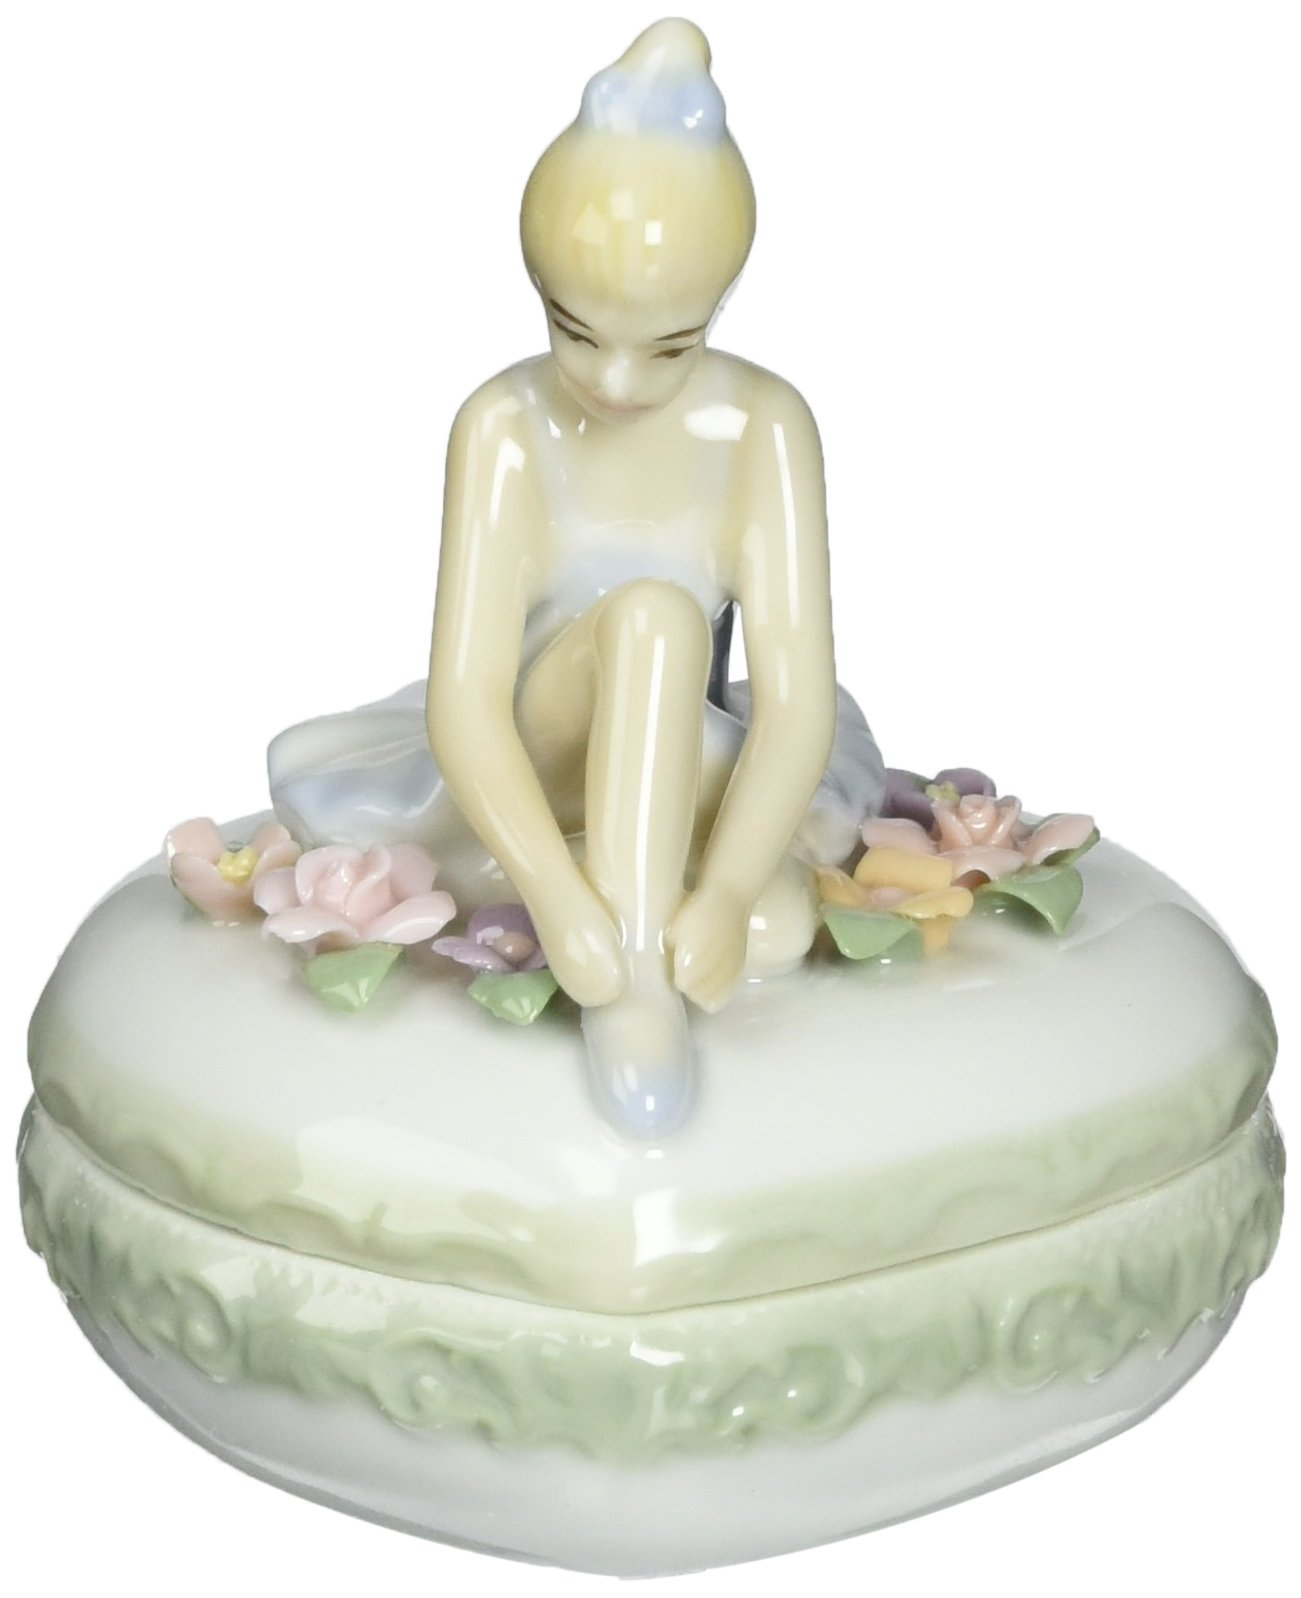 Cosmos 96379 Fine Porcelain Heart Box Ballerina Figurine, 3-1/2-Inch